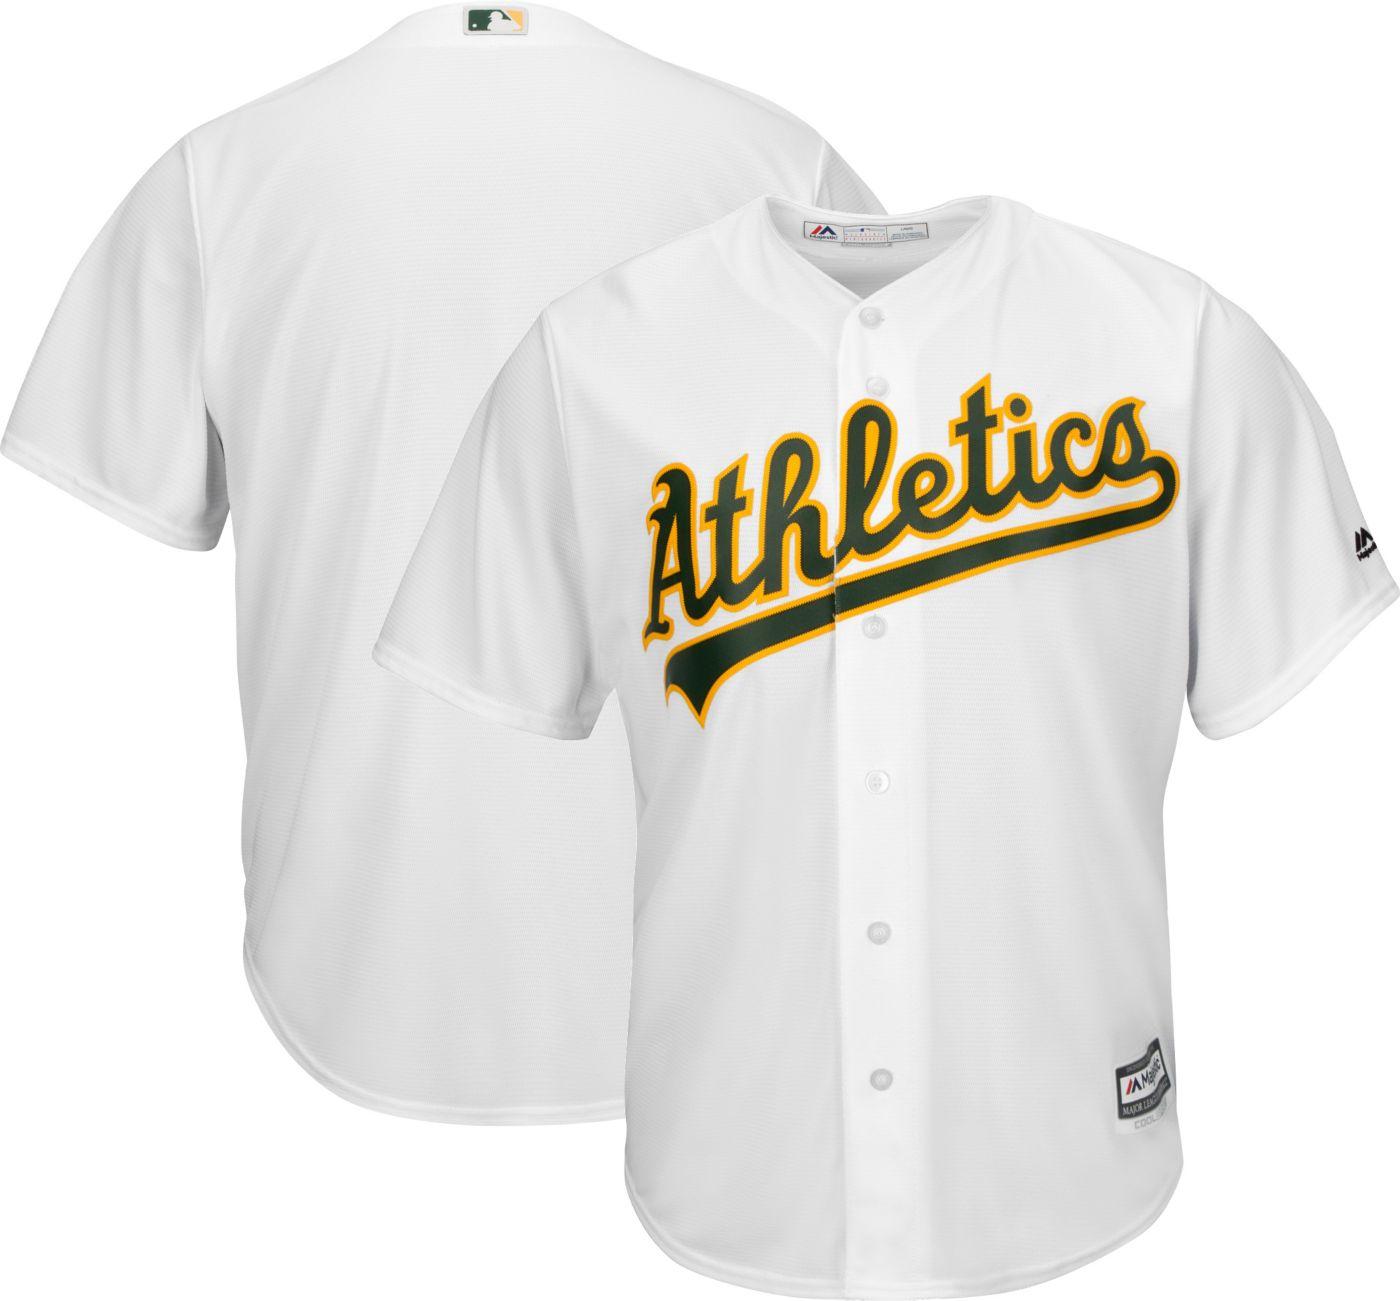 Majestic Men's Replica Oakland Athletics Cool Base Home White Jersey